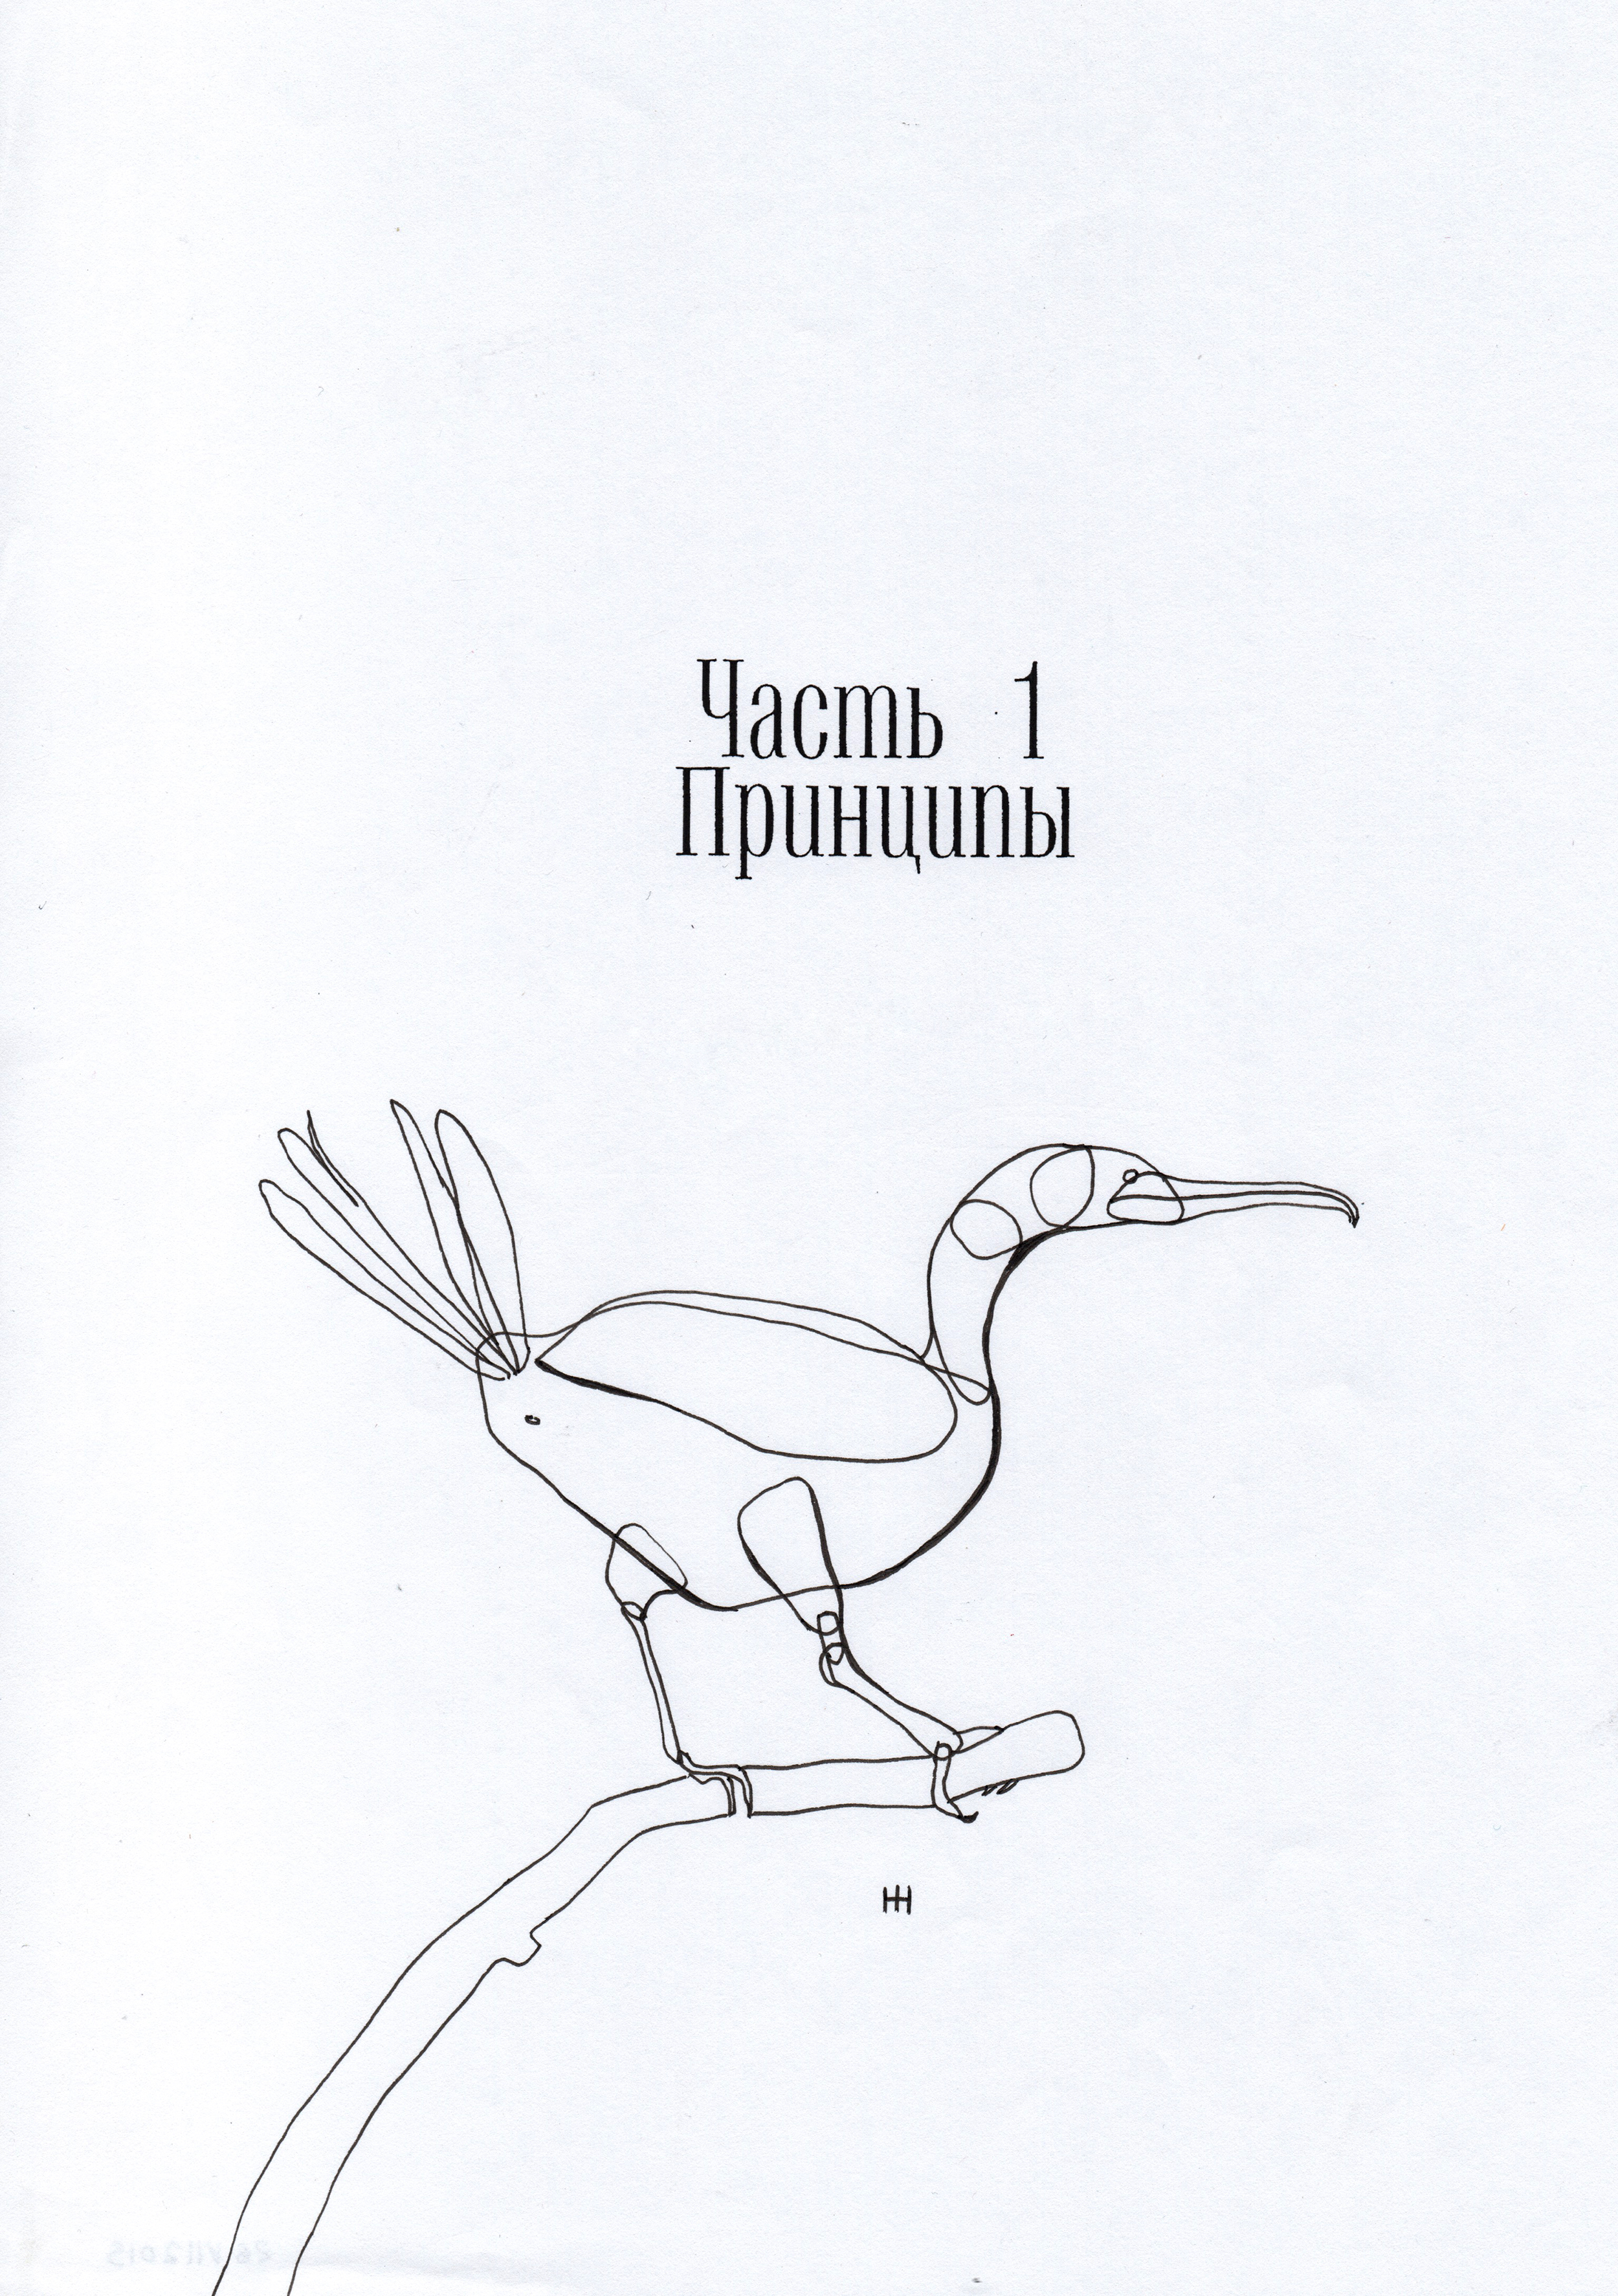 PticyLinejnye_0 3.jpg